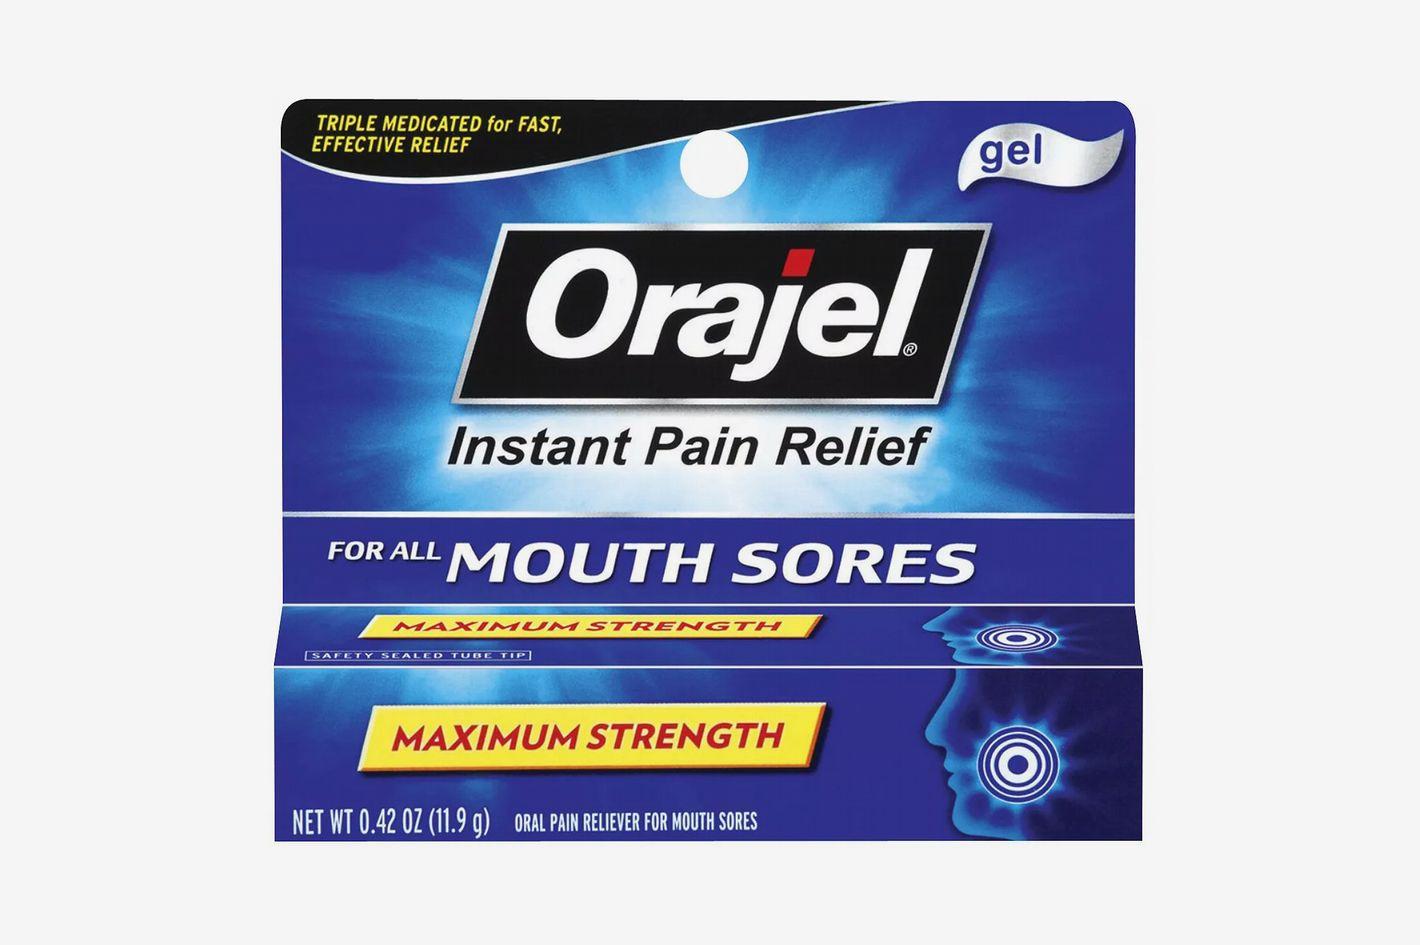 Orajel Instant Pain Relief Gel for Mouth Sores, 0.42 oz